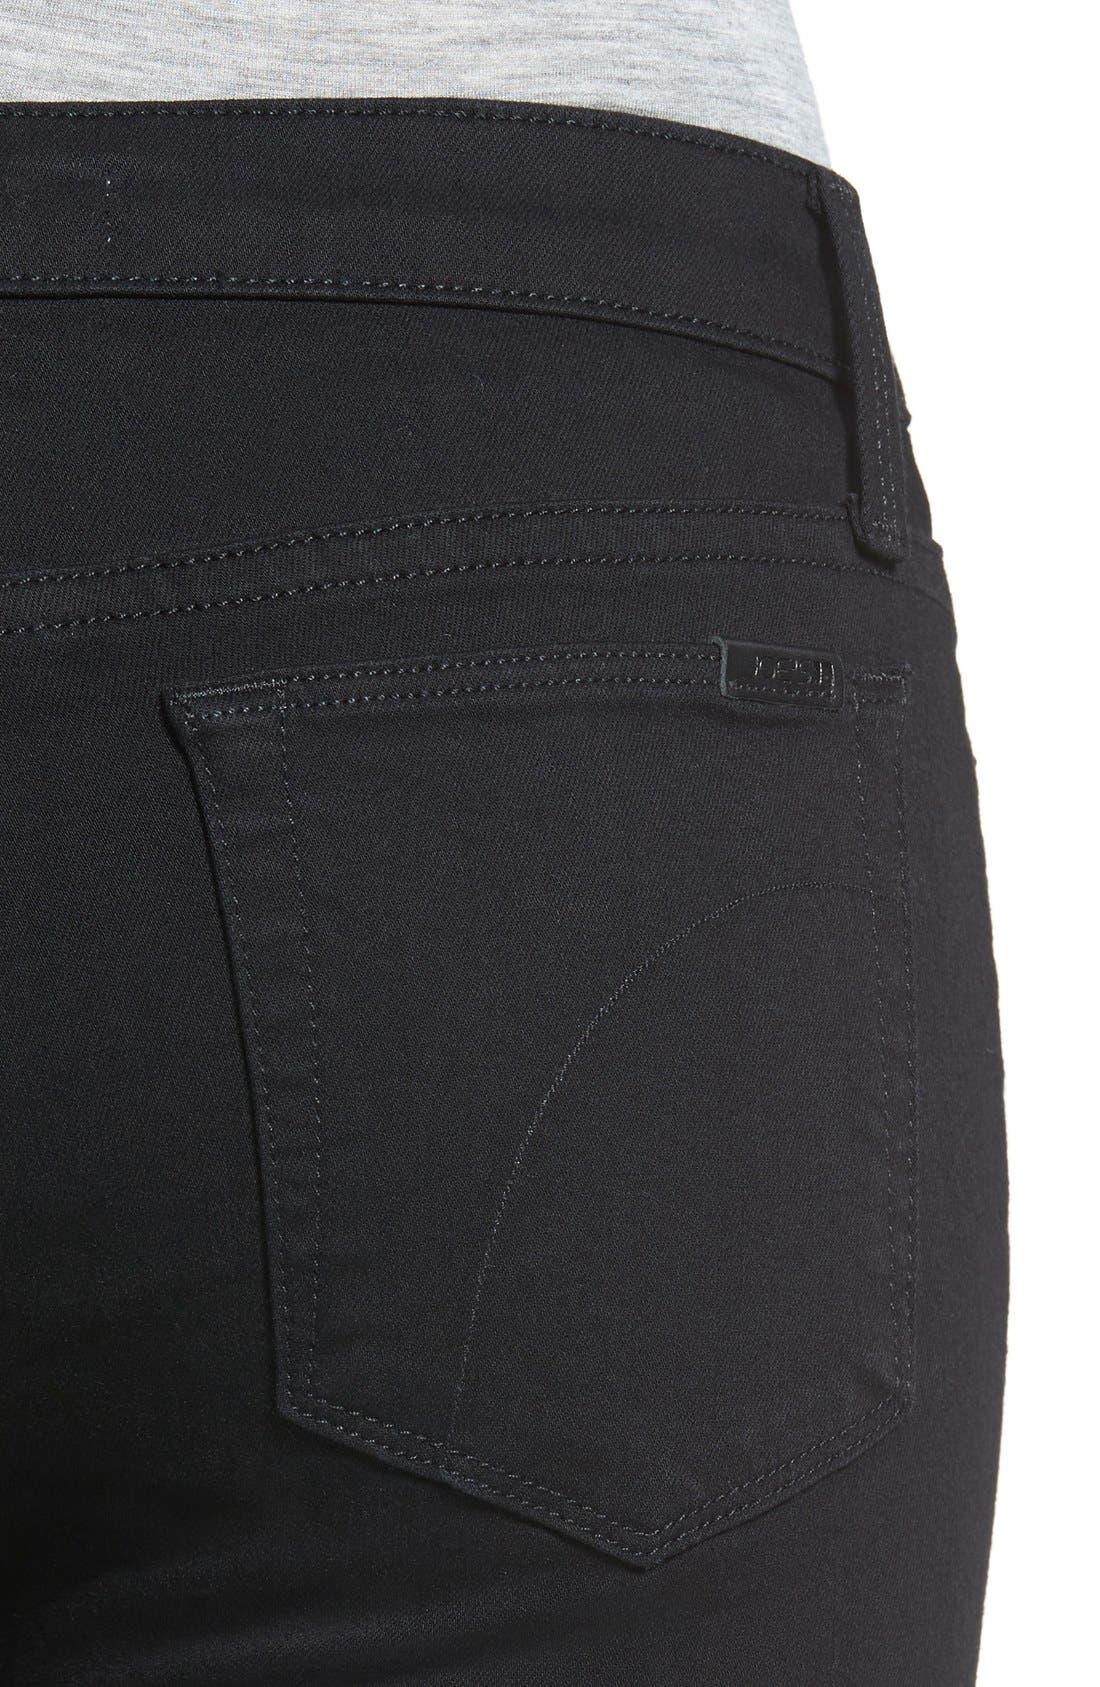 'Flawless - Twiggy' Skinny Jeans,                             Alternate thumbnail 4, color,                             Regan